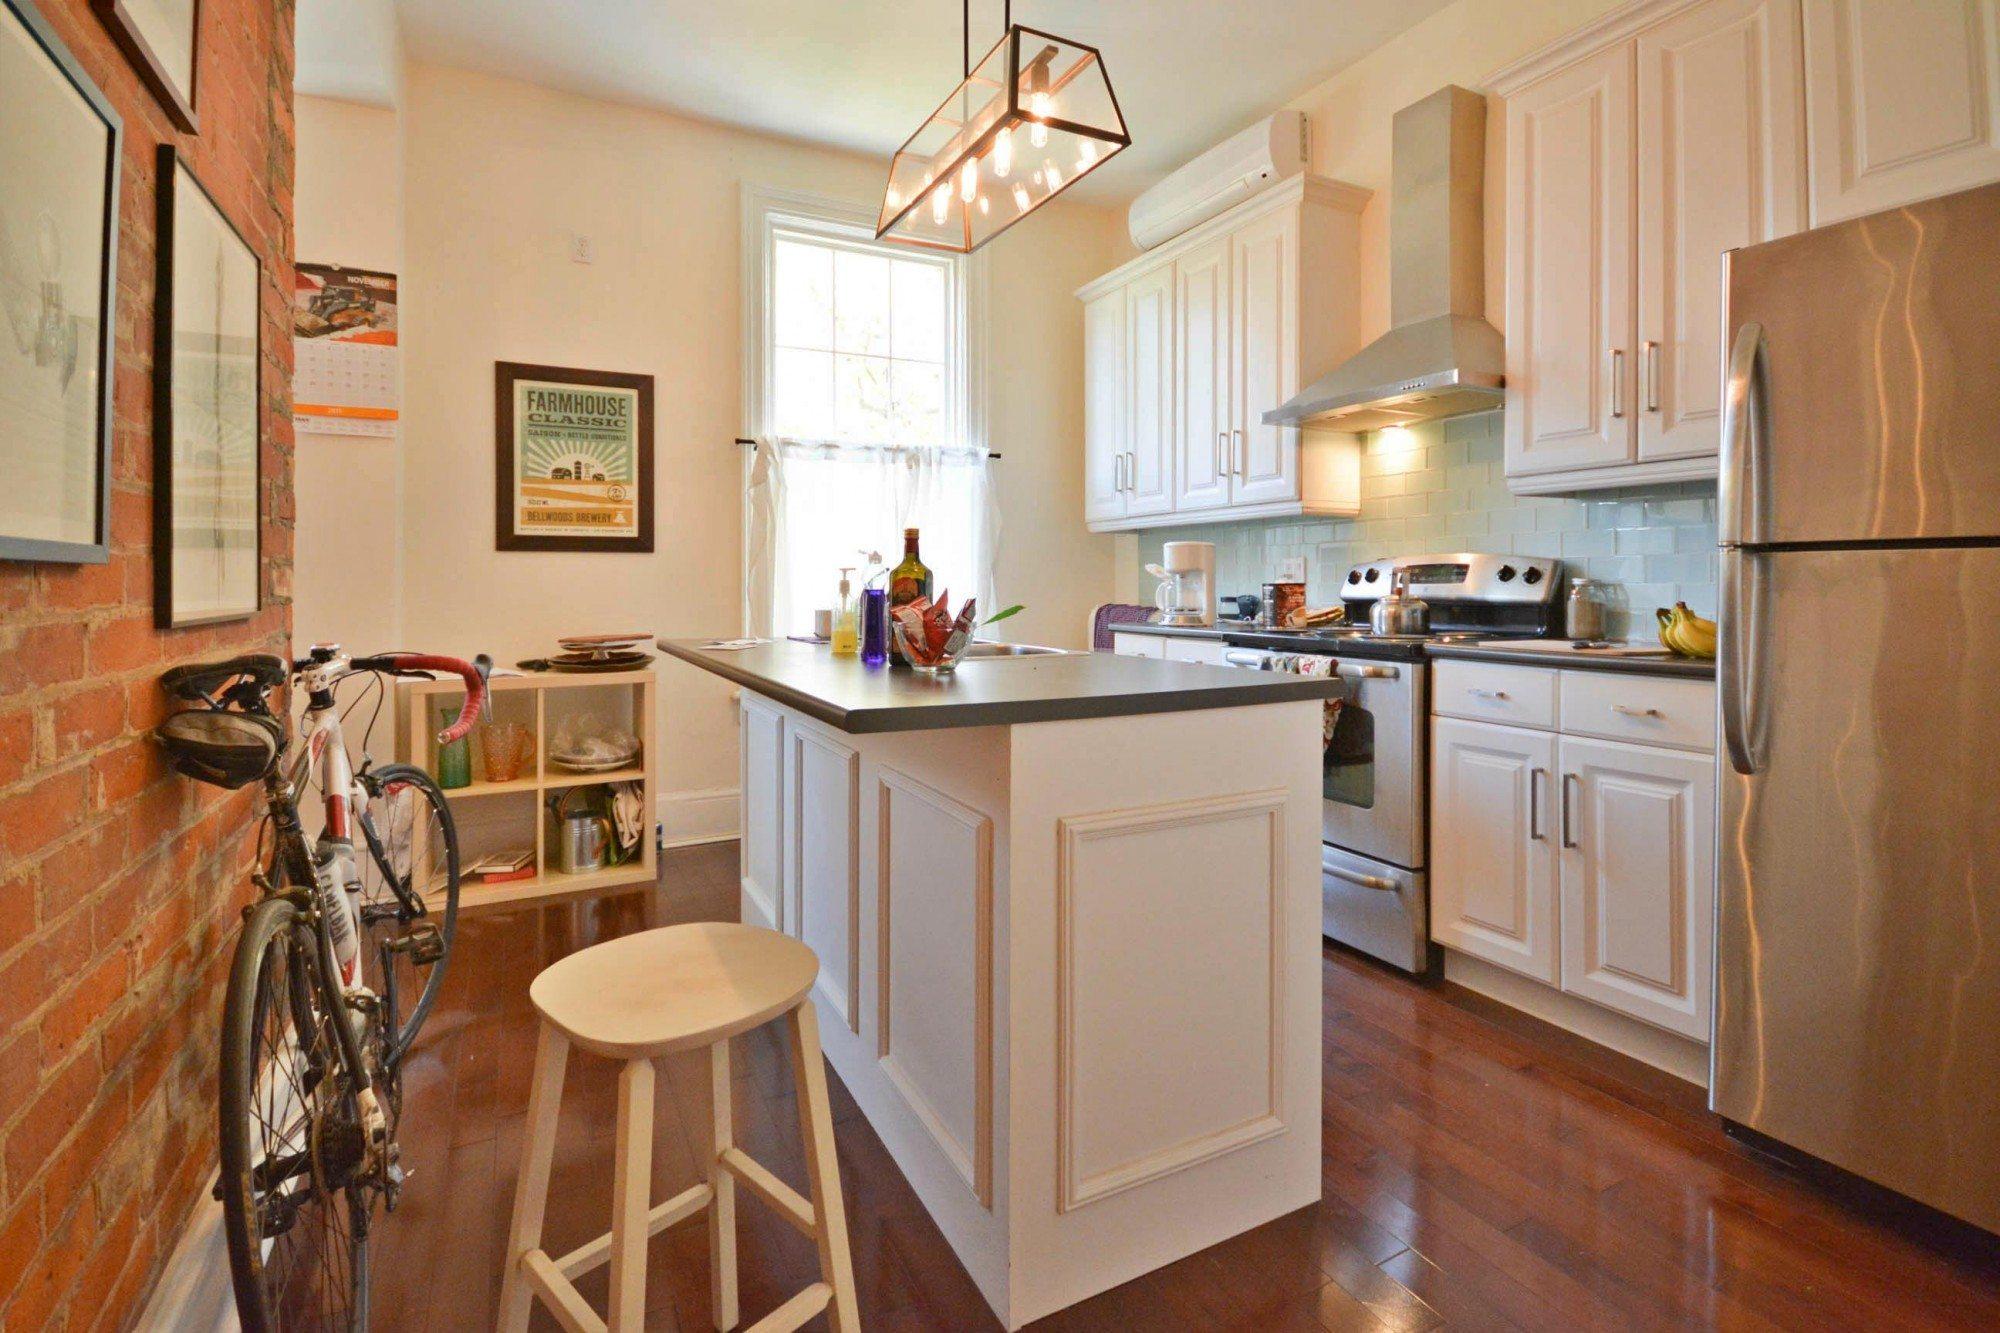 toronto-house-for-sale-81-pembroke-street-15